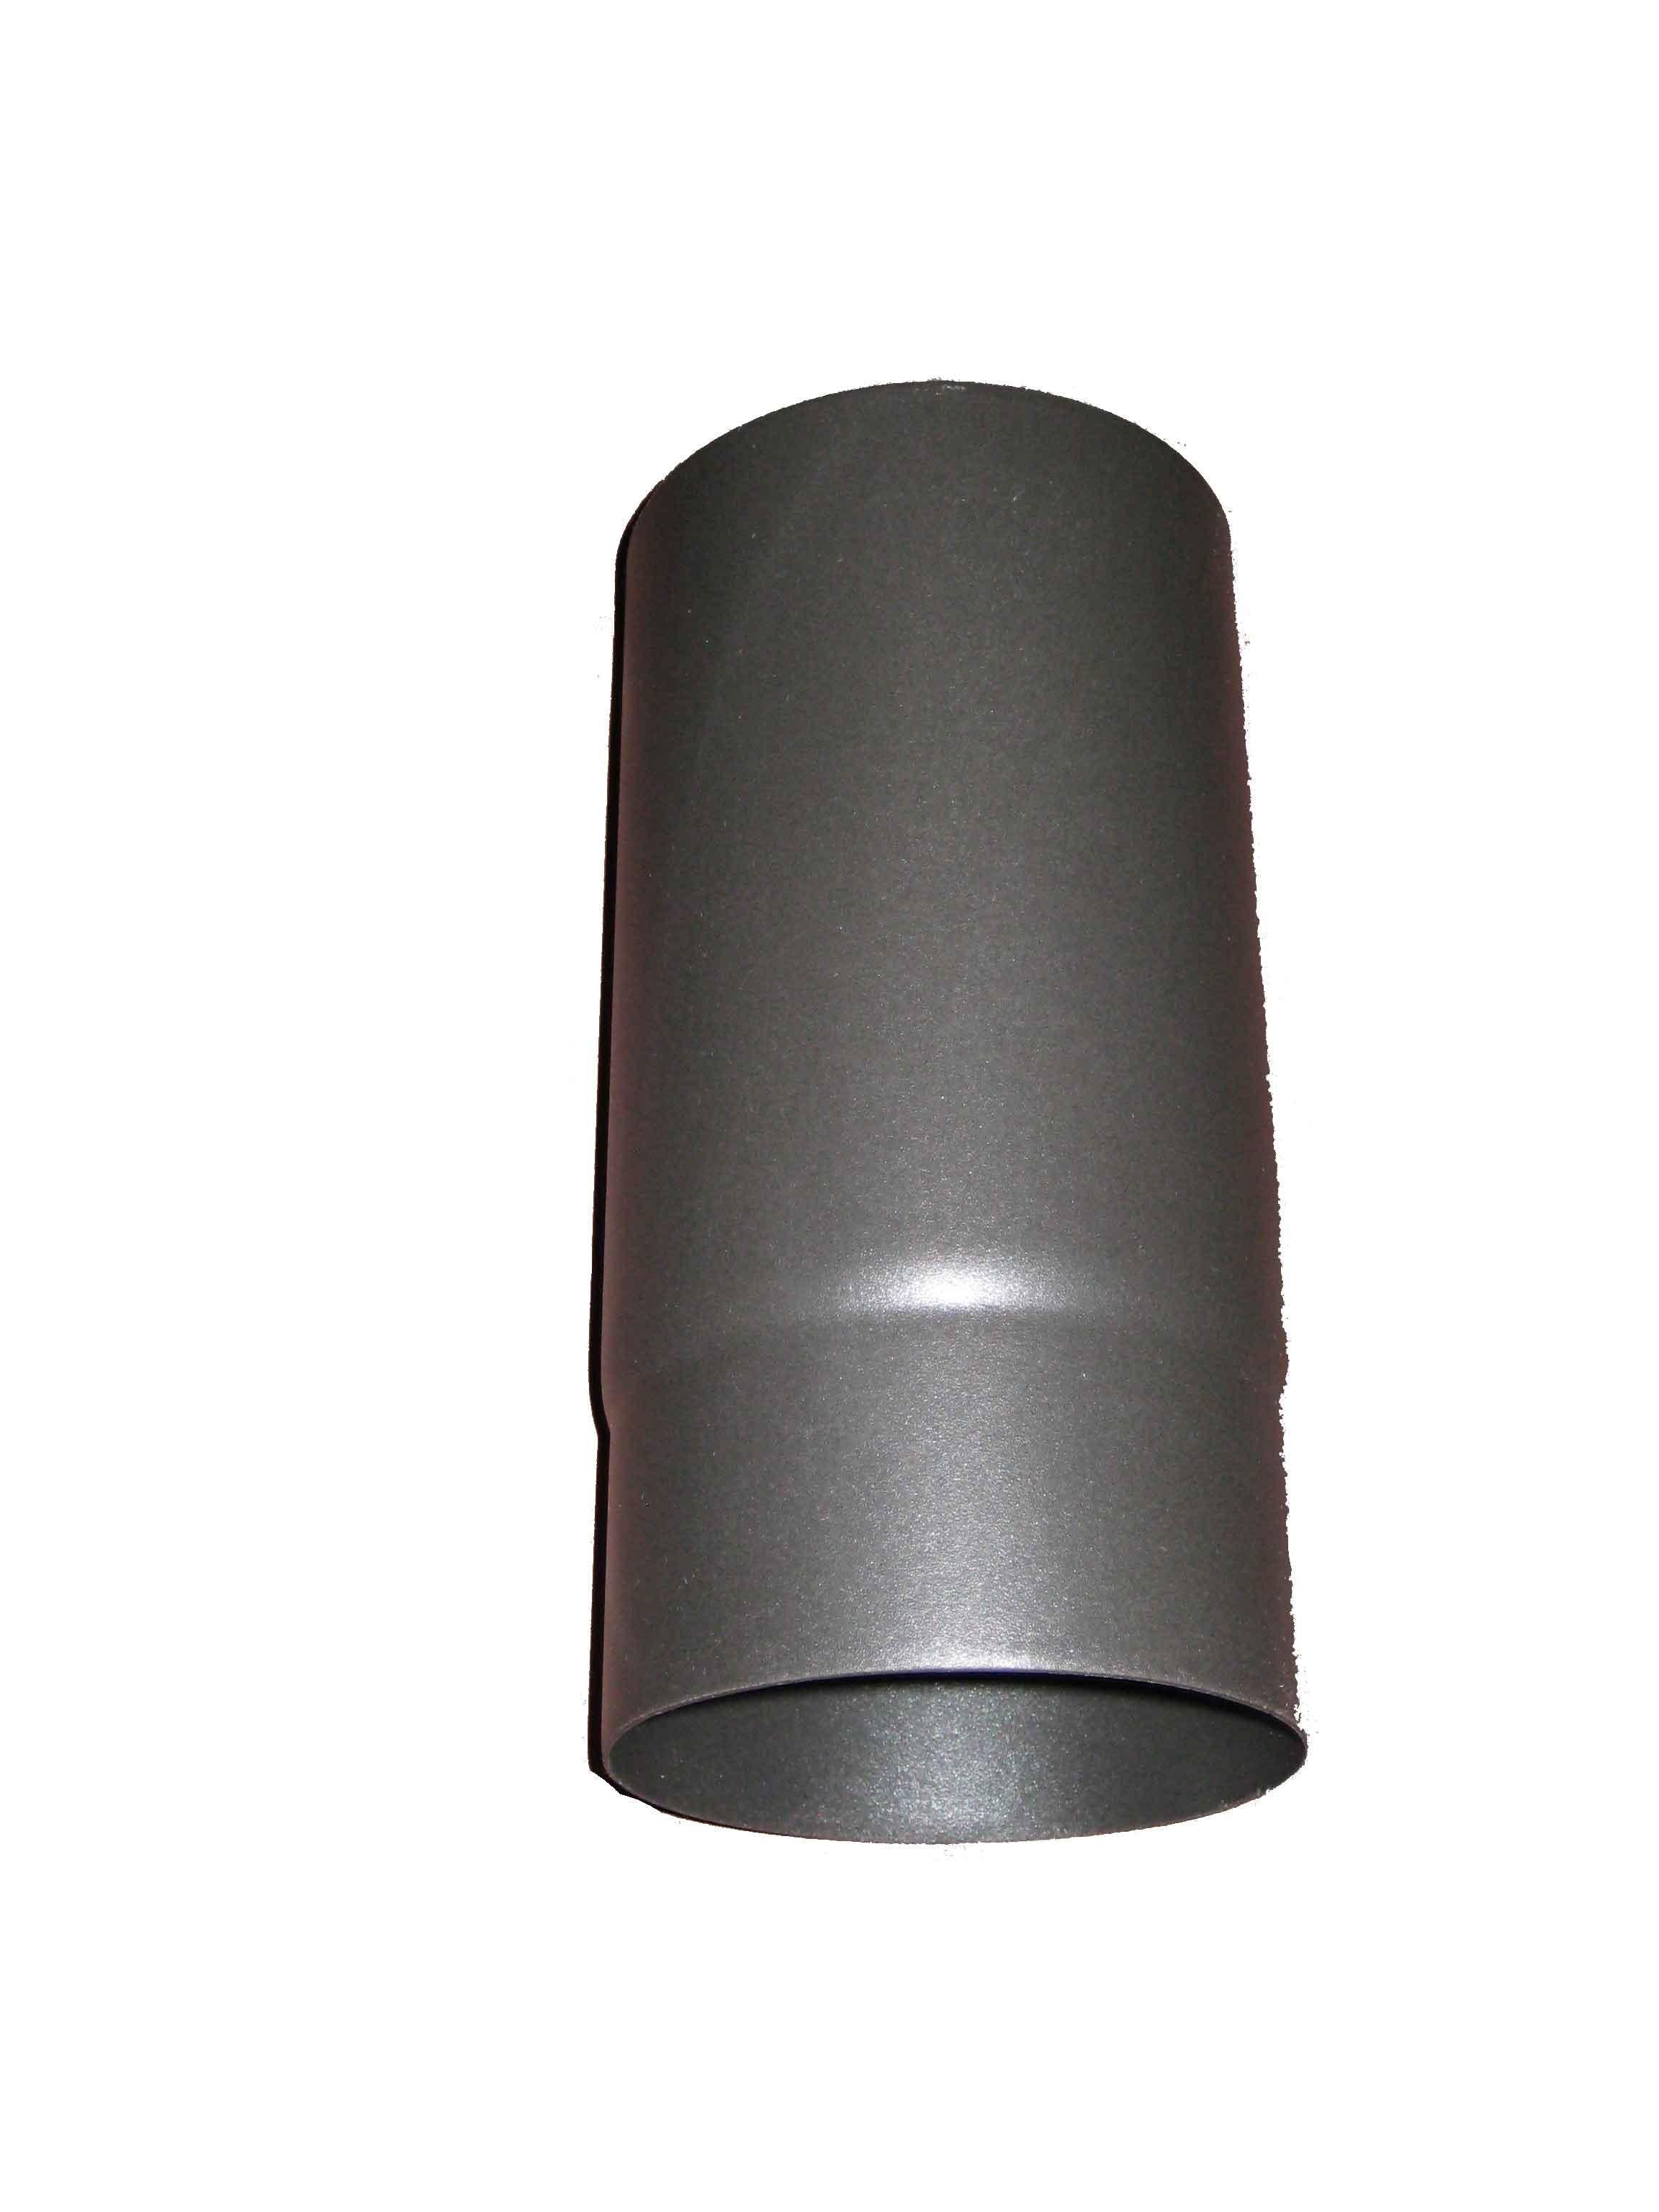 "Matt Black Enamel 250mm Straight MBE Pipe 5"""